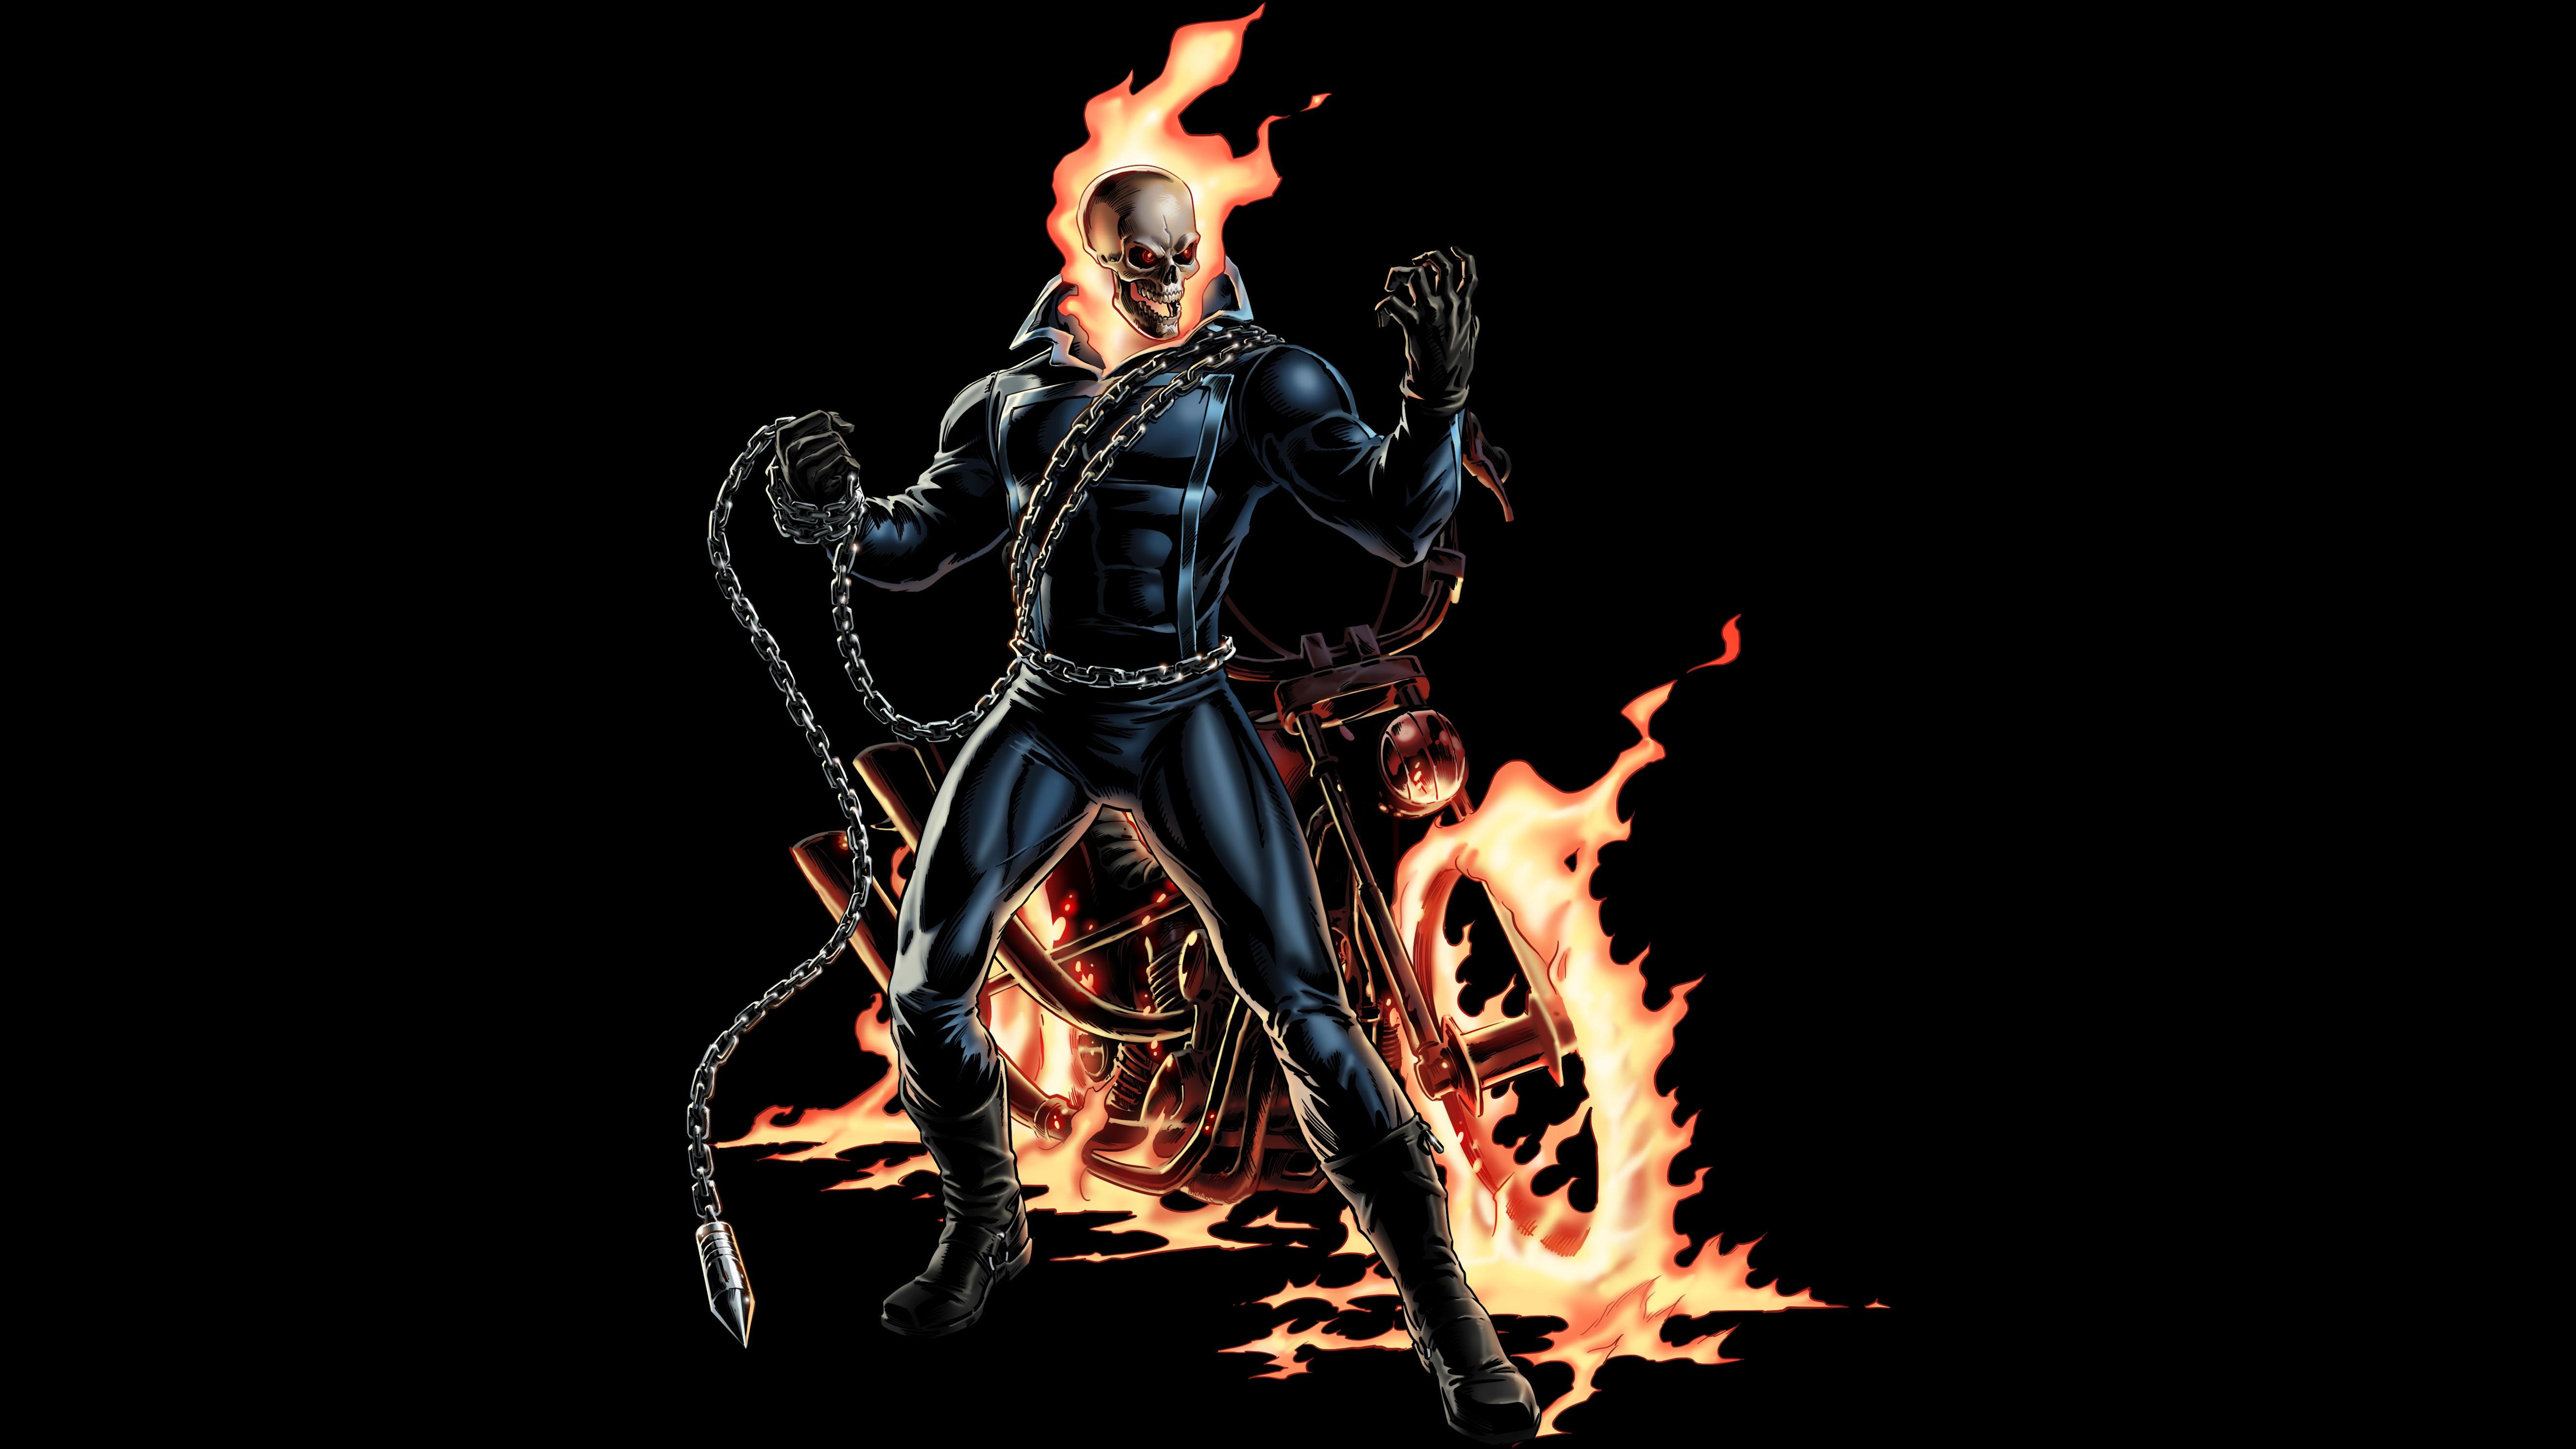 Ghost Rider Computer Wallpapers Desktop Backgrounds 5300x2981 ID 5300x2981